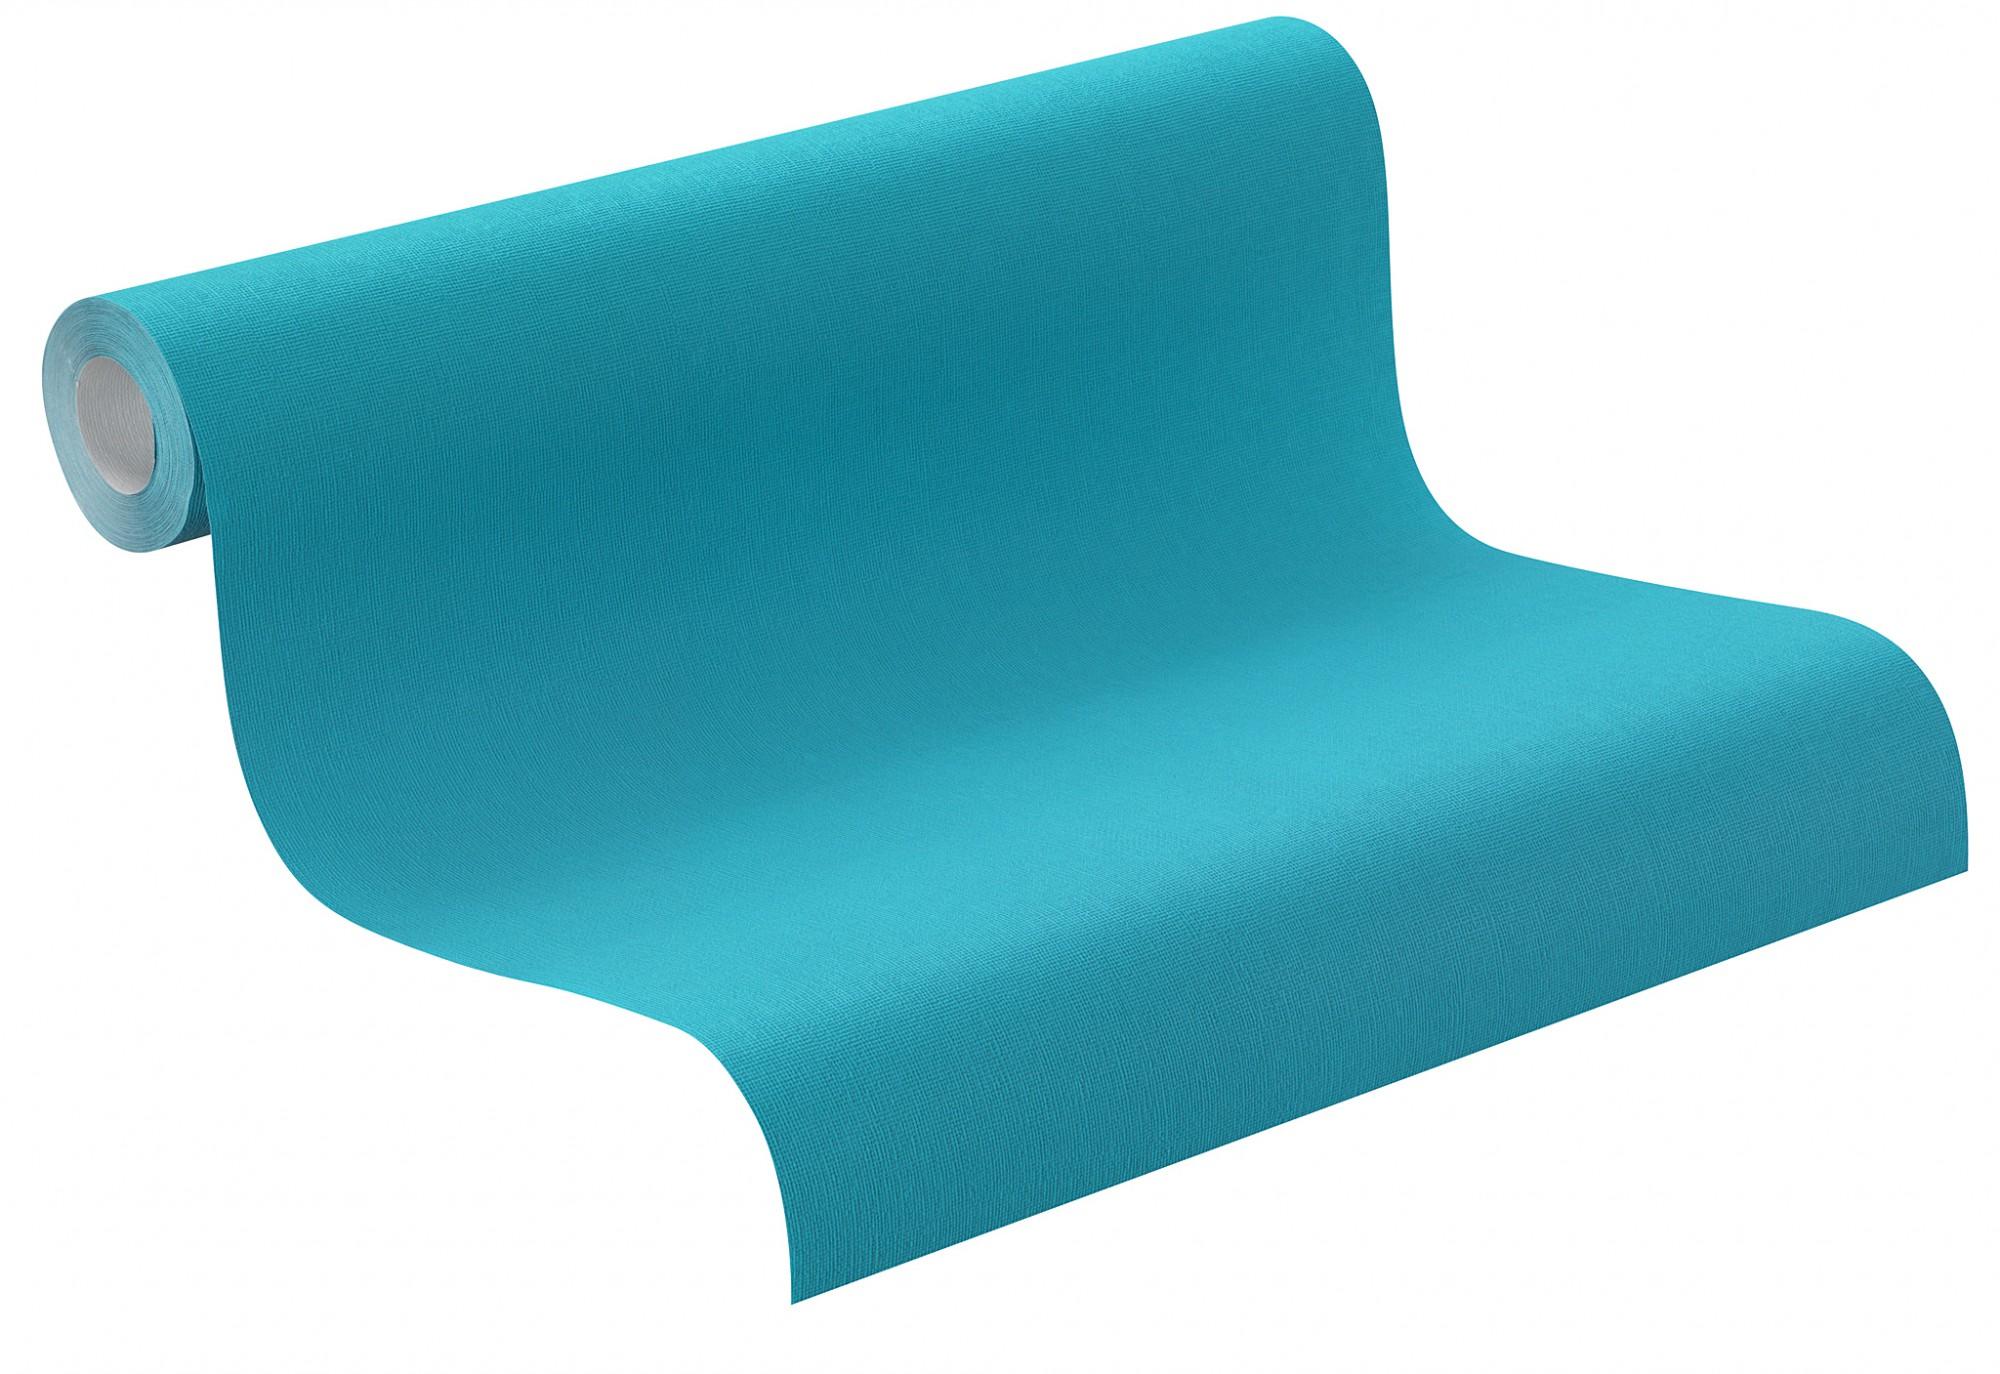 vliestapete rasch tapete 721904 uni t rkis tapeten rasch funky flair 2015. Black Bedroom Furniture Sets. Home Design Ideas